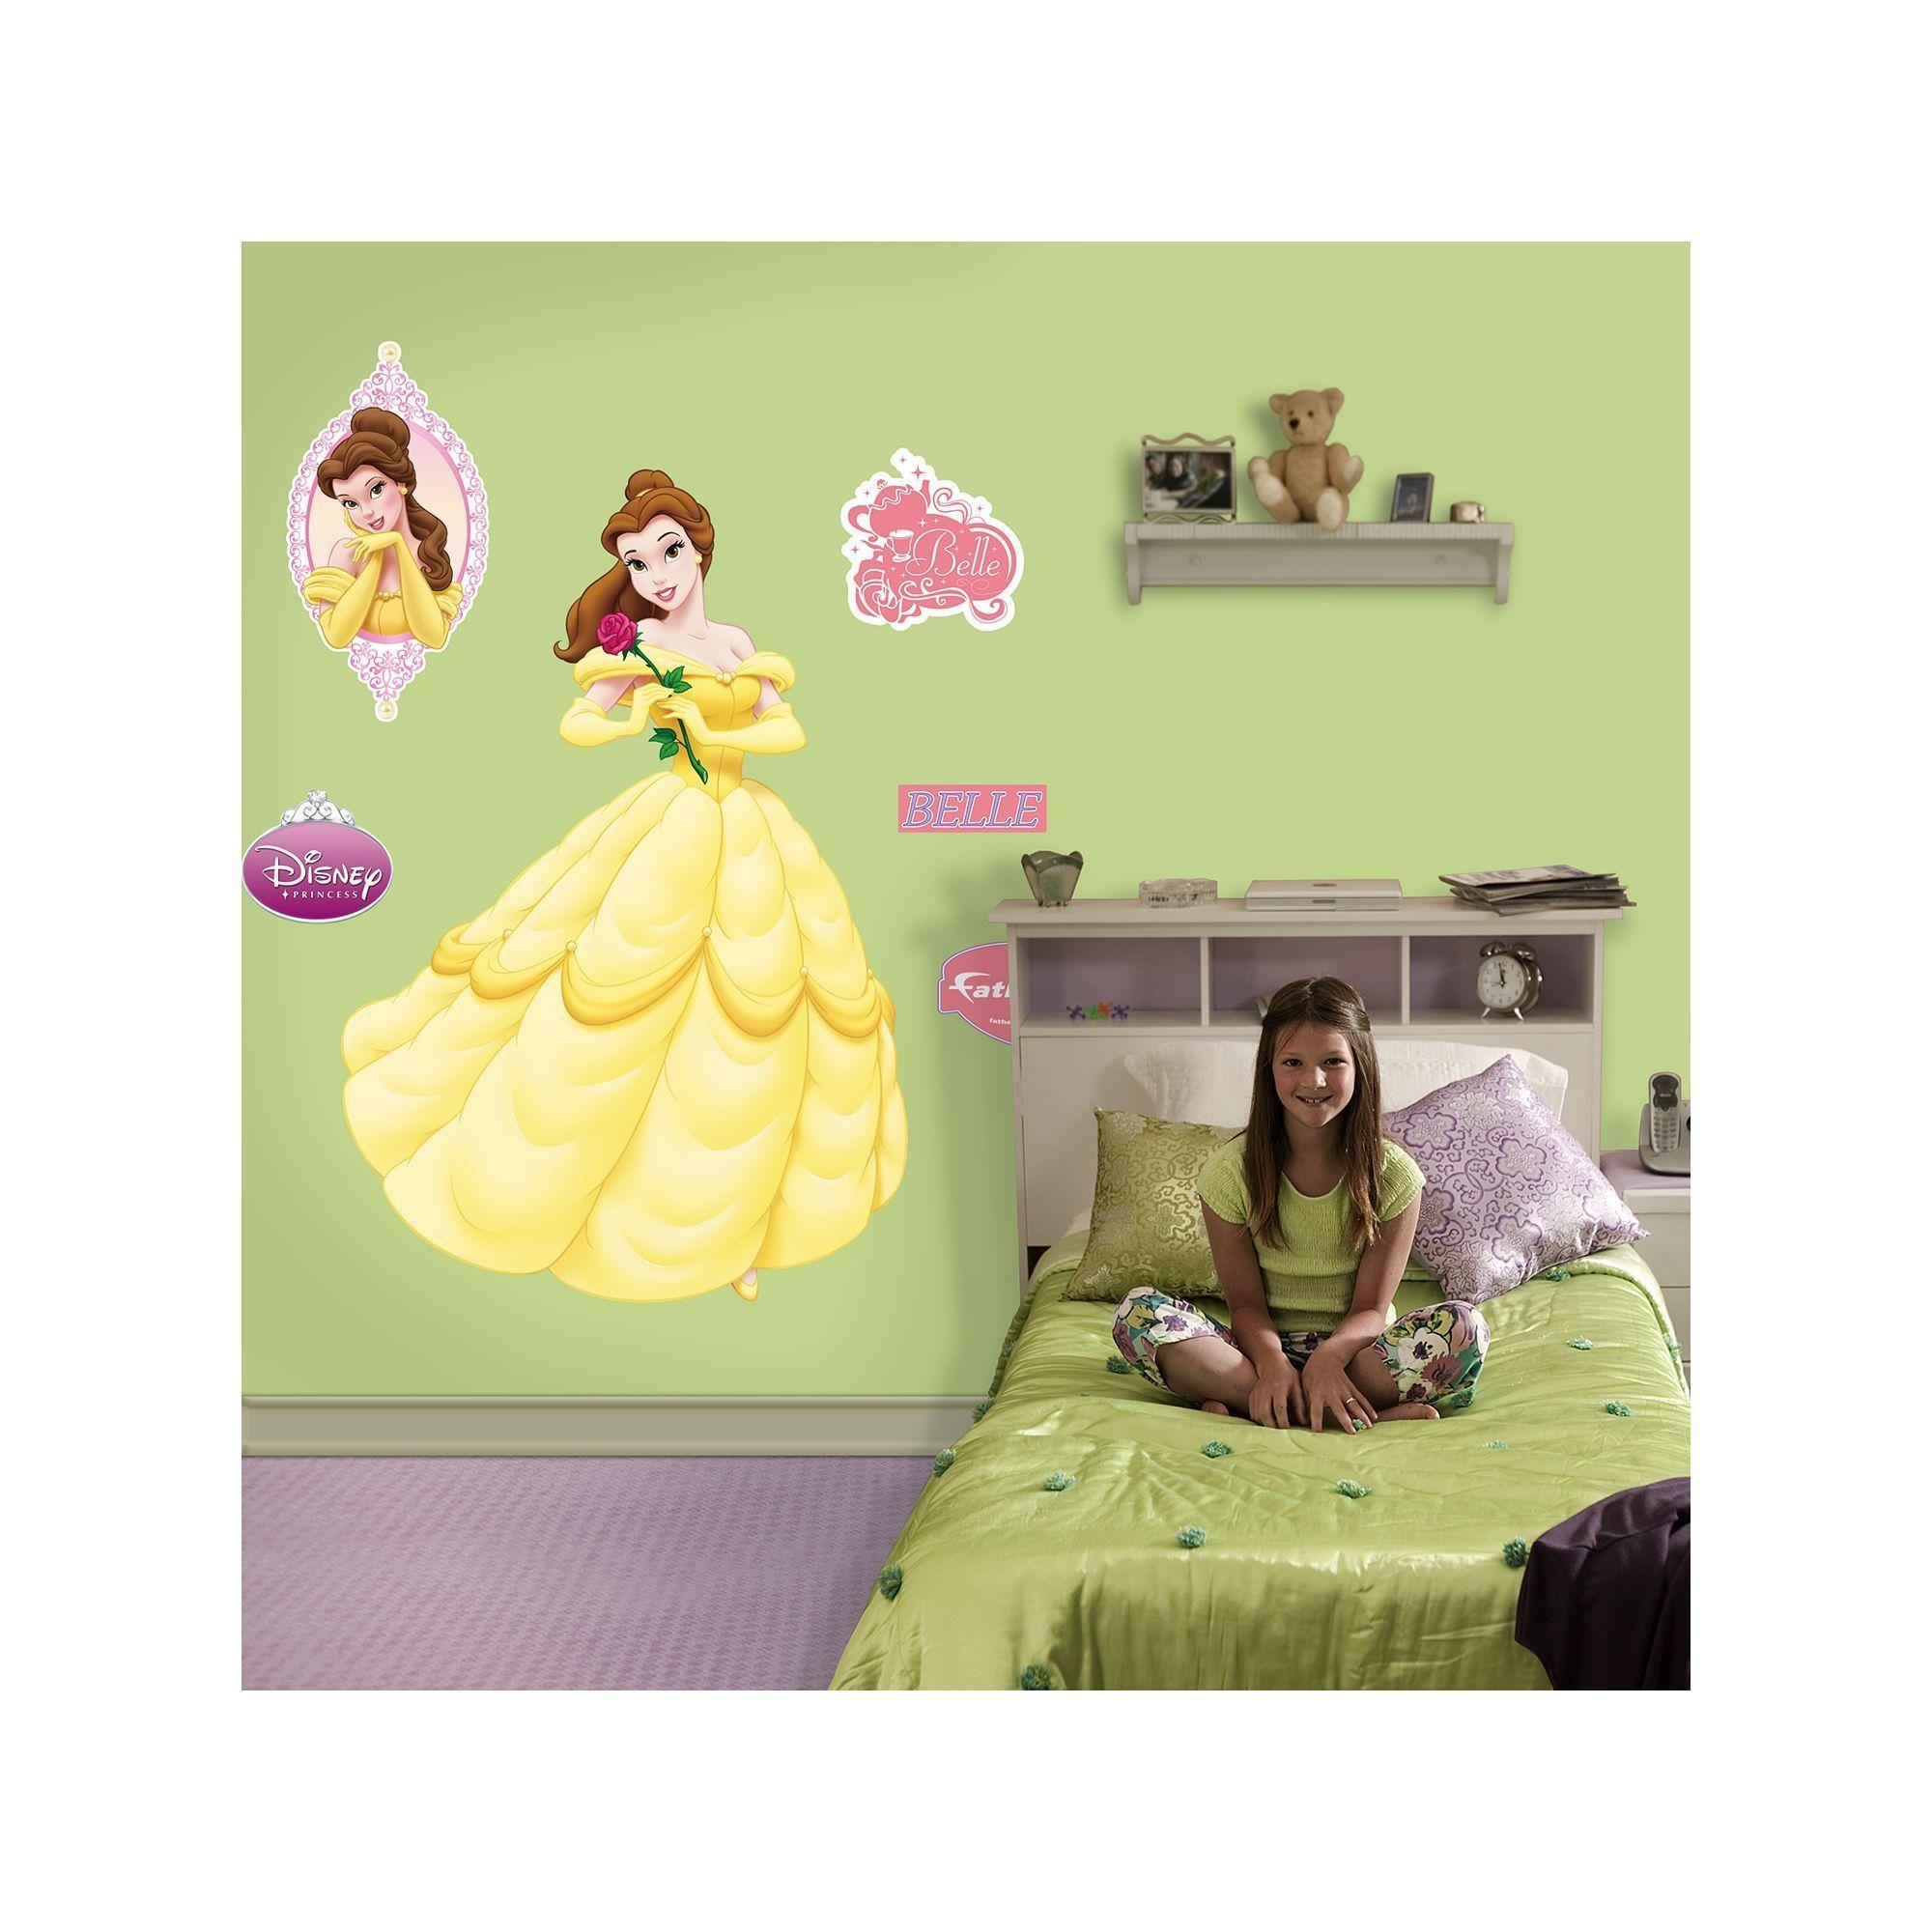 Charming Fathead Princess Wall Decor Gallery - The Wall Art ...